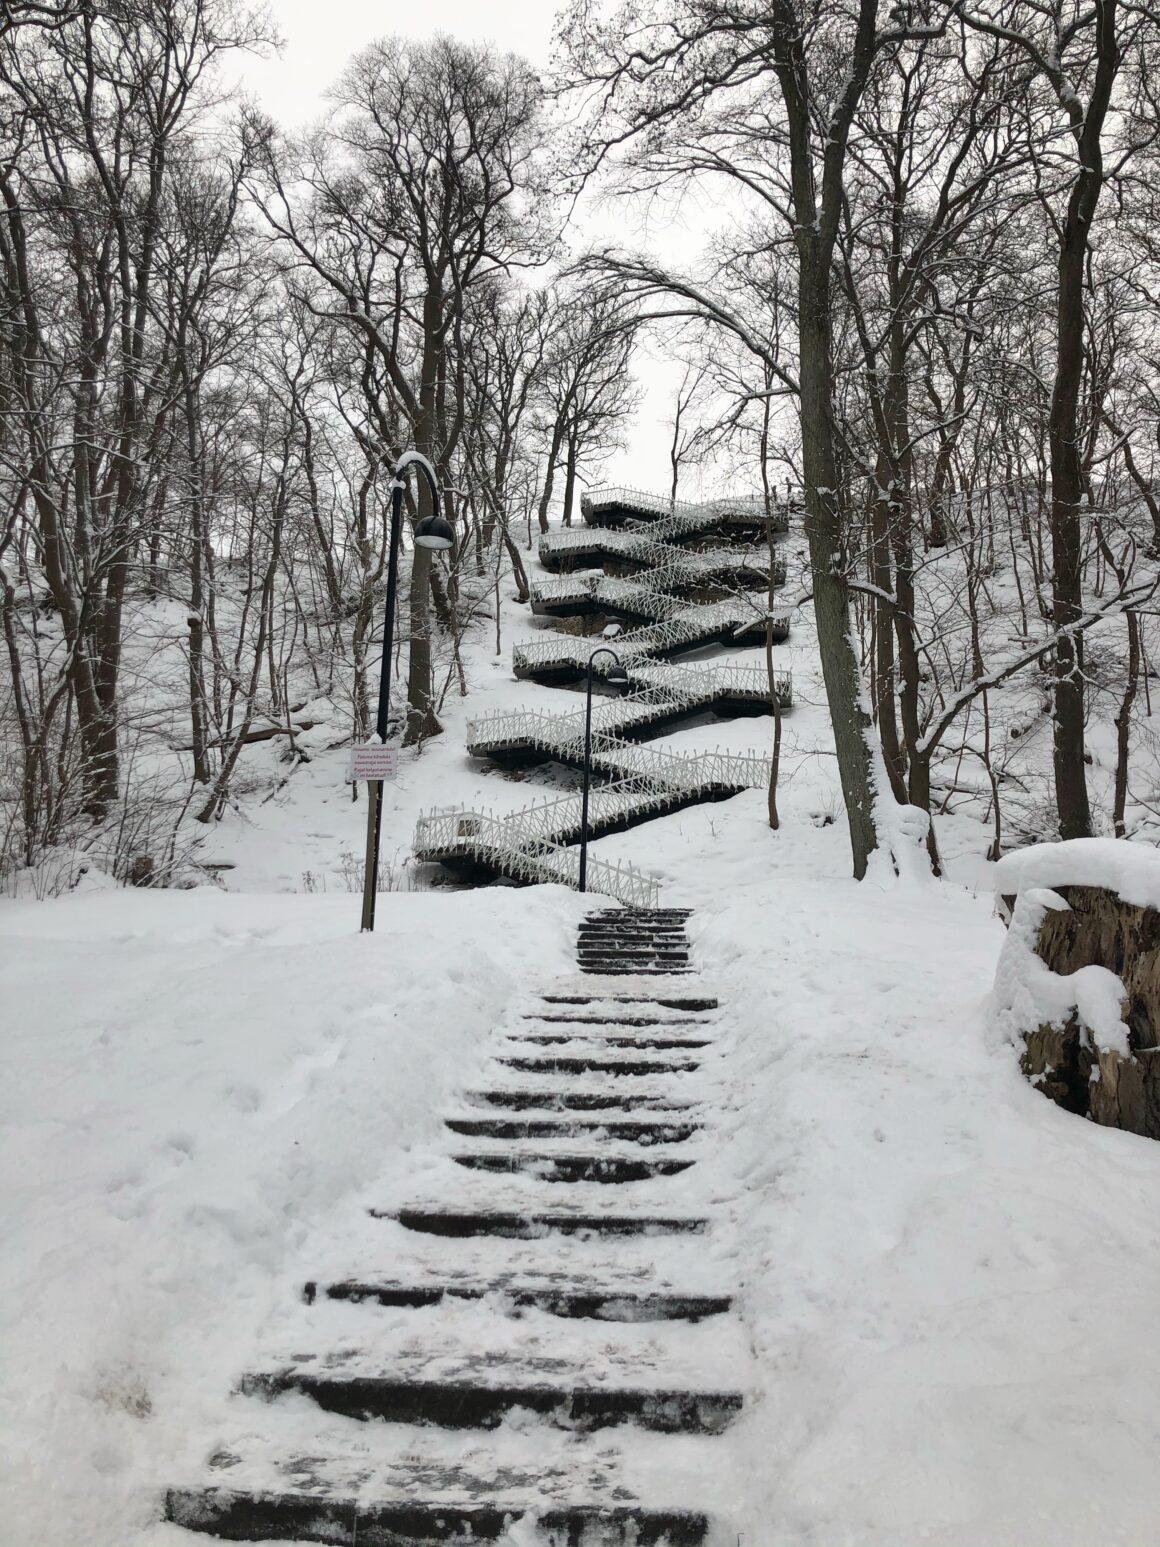 Põhjakonnan portaat kauempaa